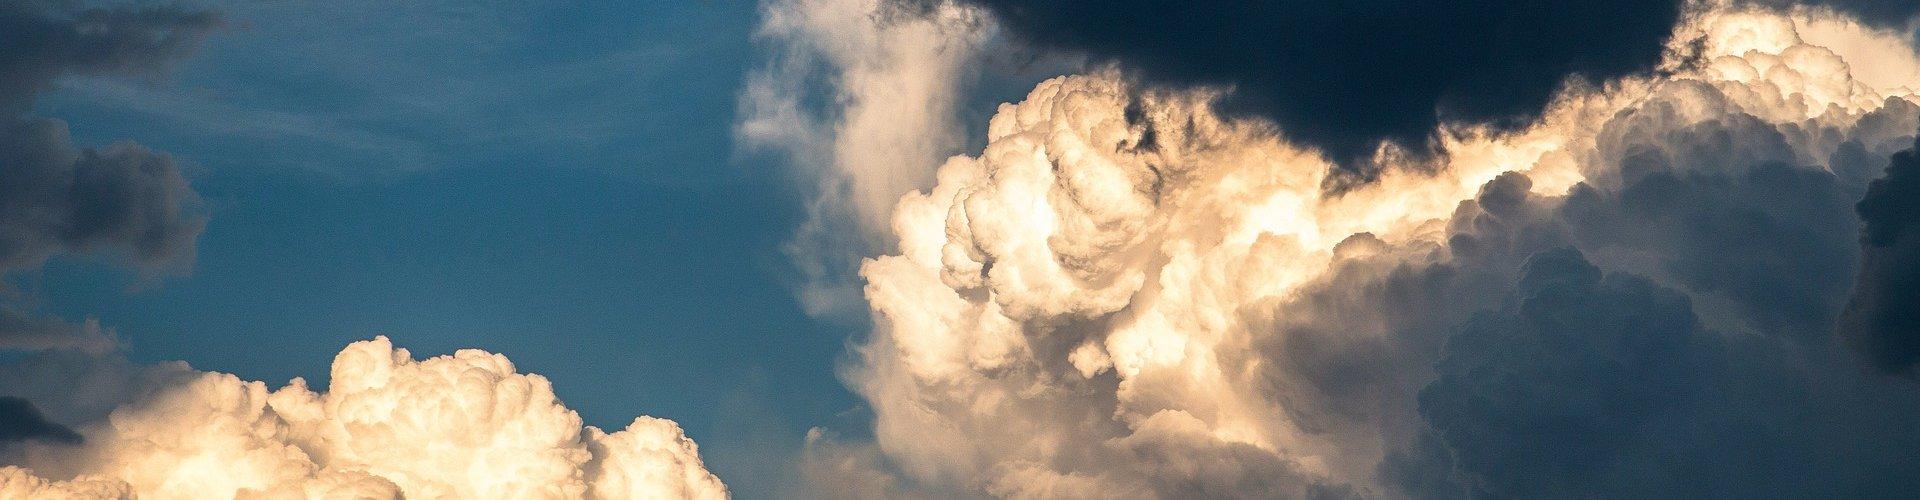 IBM Cloud Email Statistics: registrazione del webinar di IBM